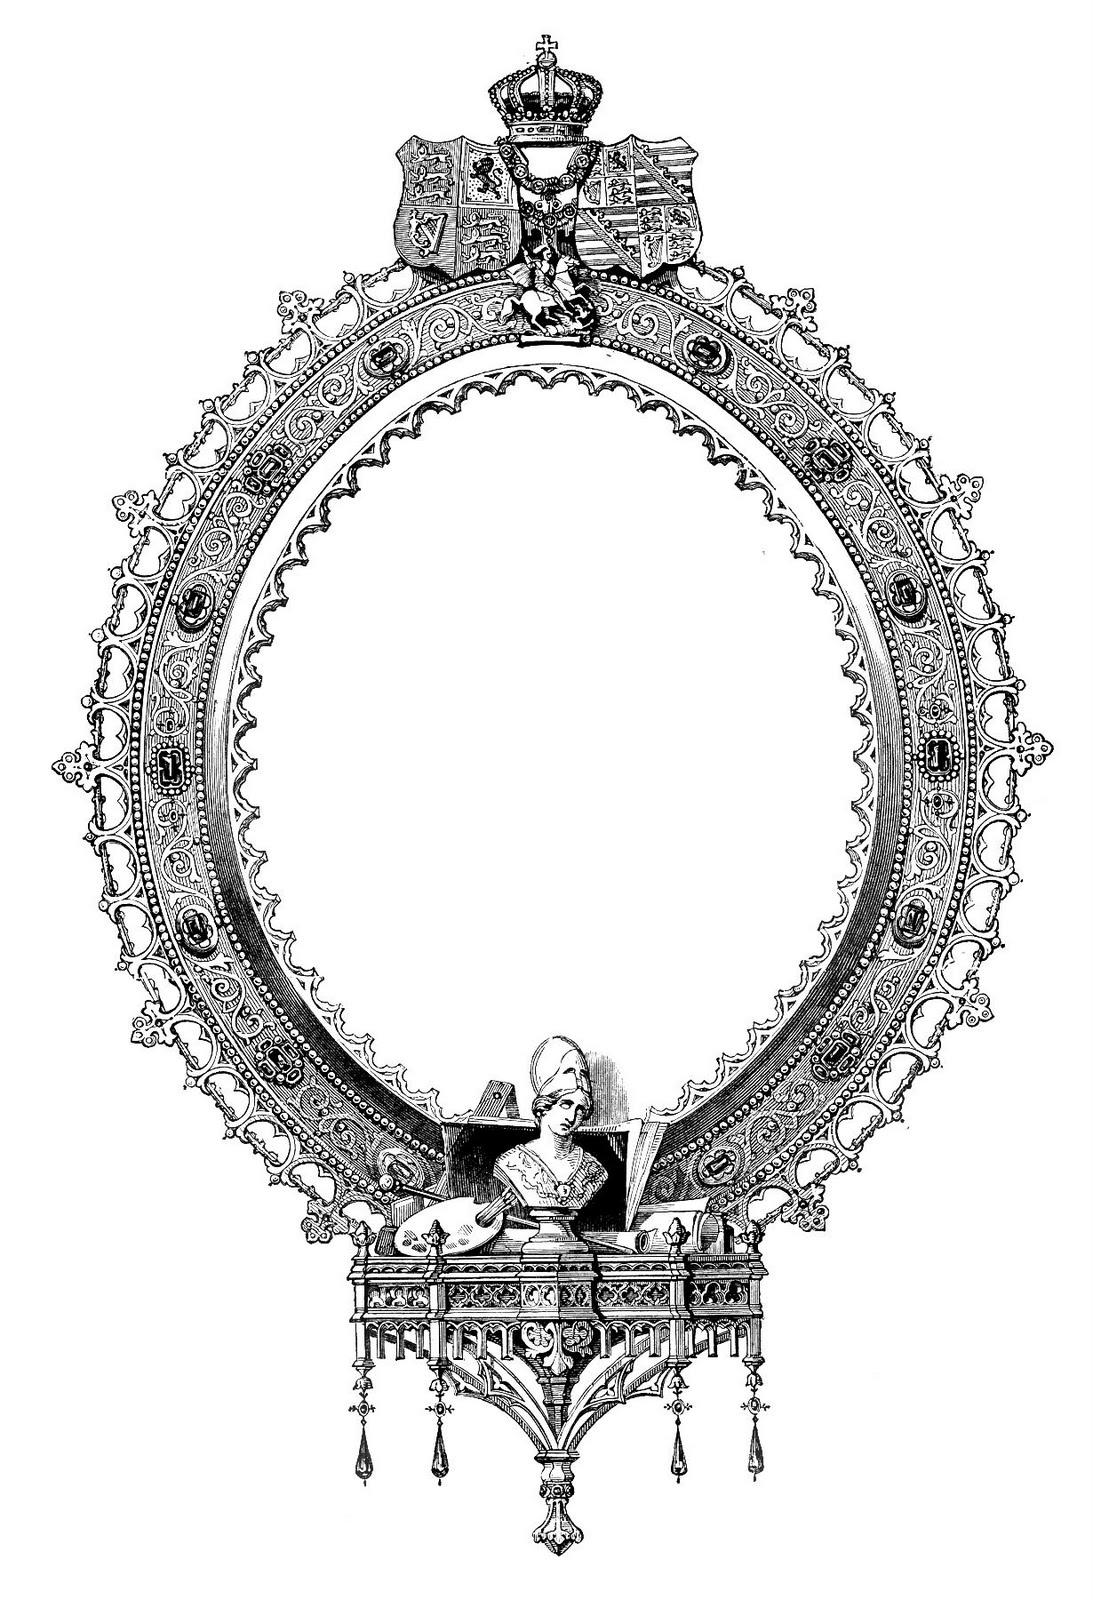 ornate frame clip art image with crown - Engraved Frame